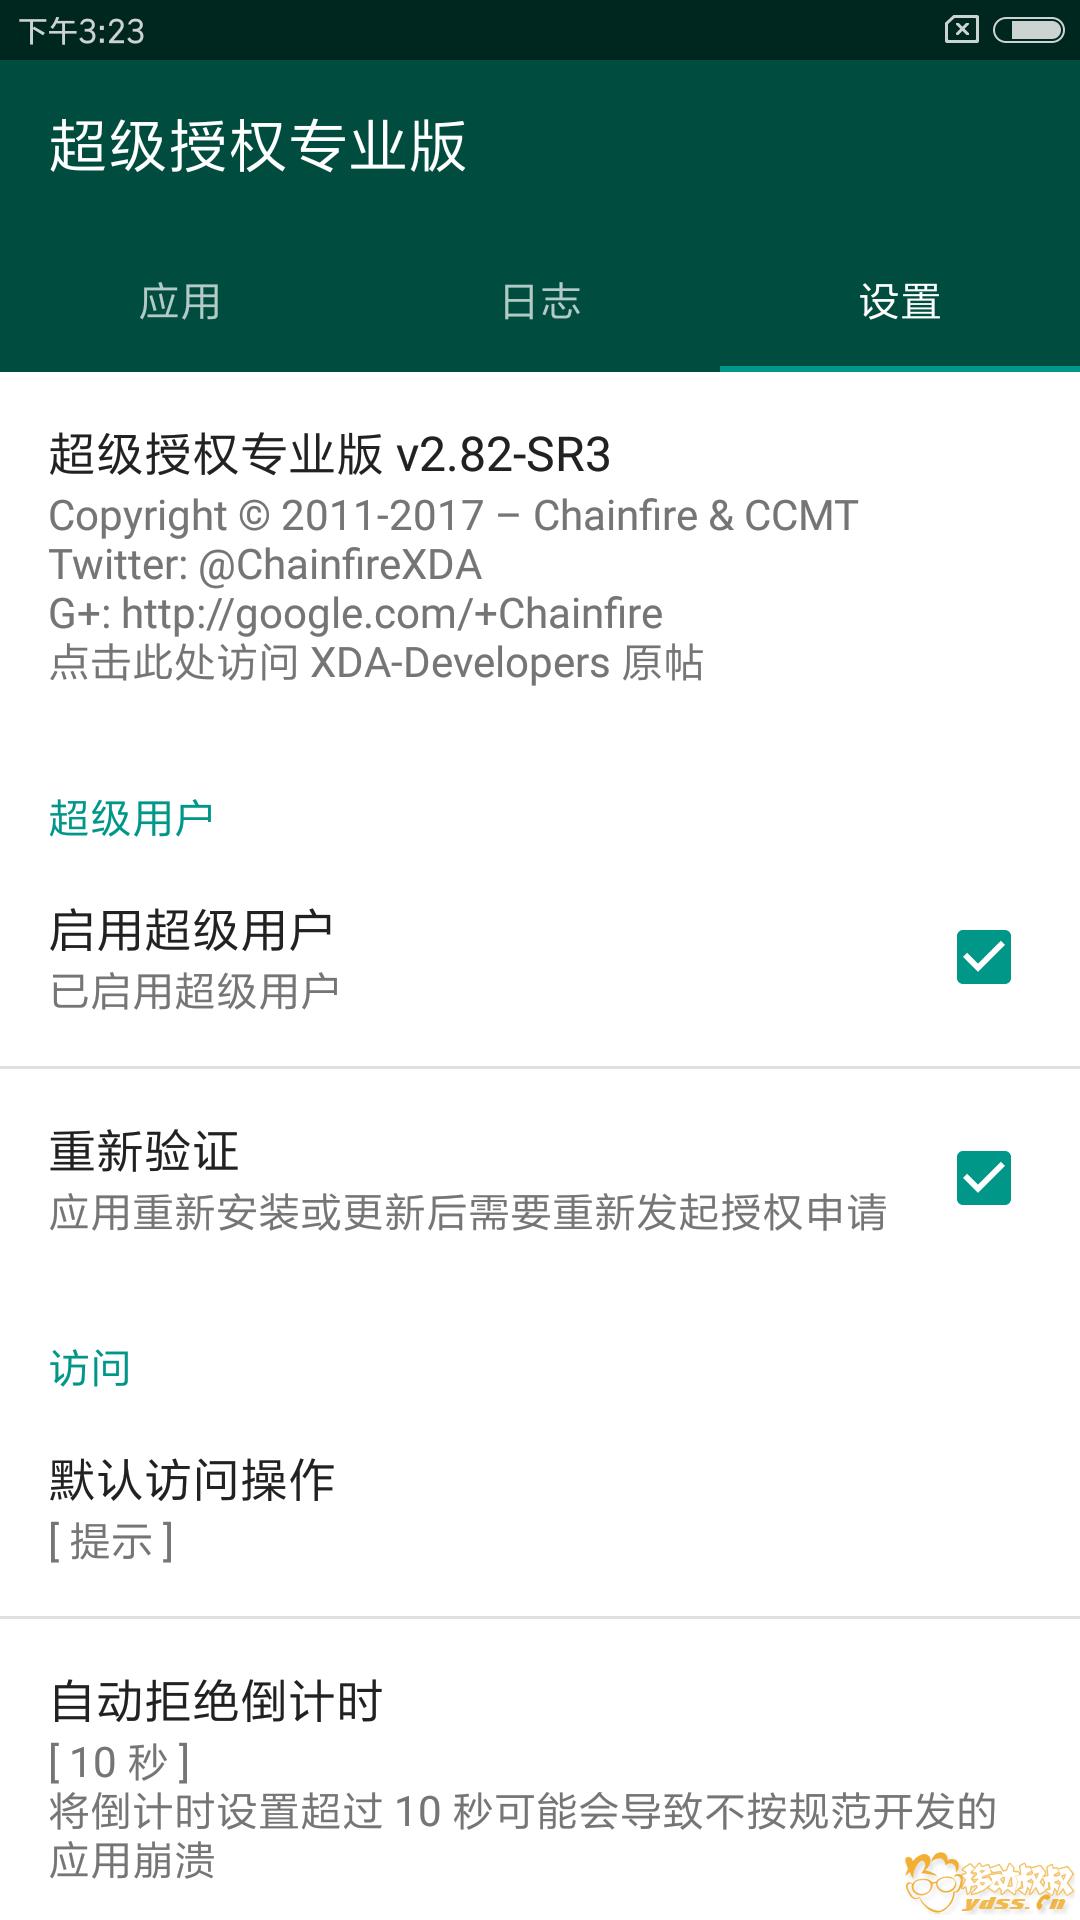 Screenshot_2018-06-16-15-23-34-902_eu.chainfire.supersu.png